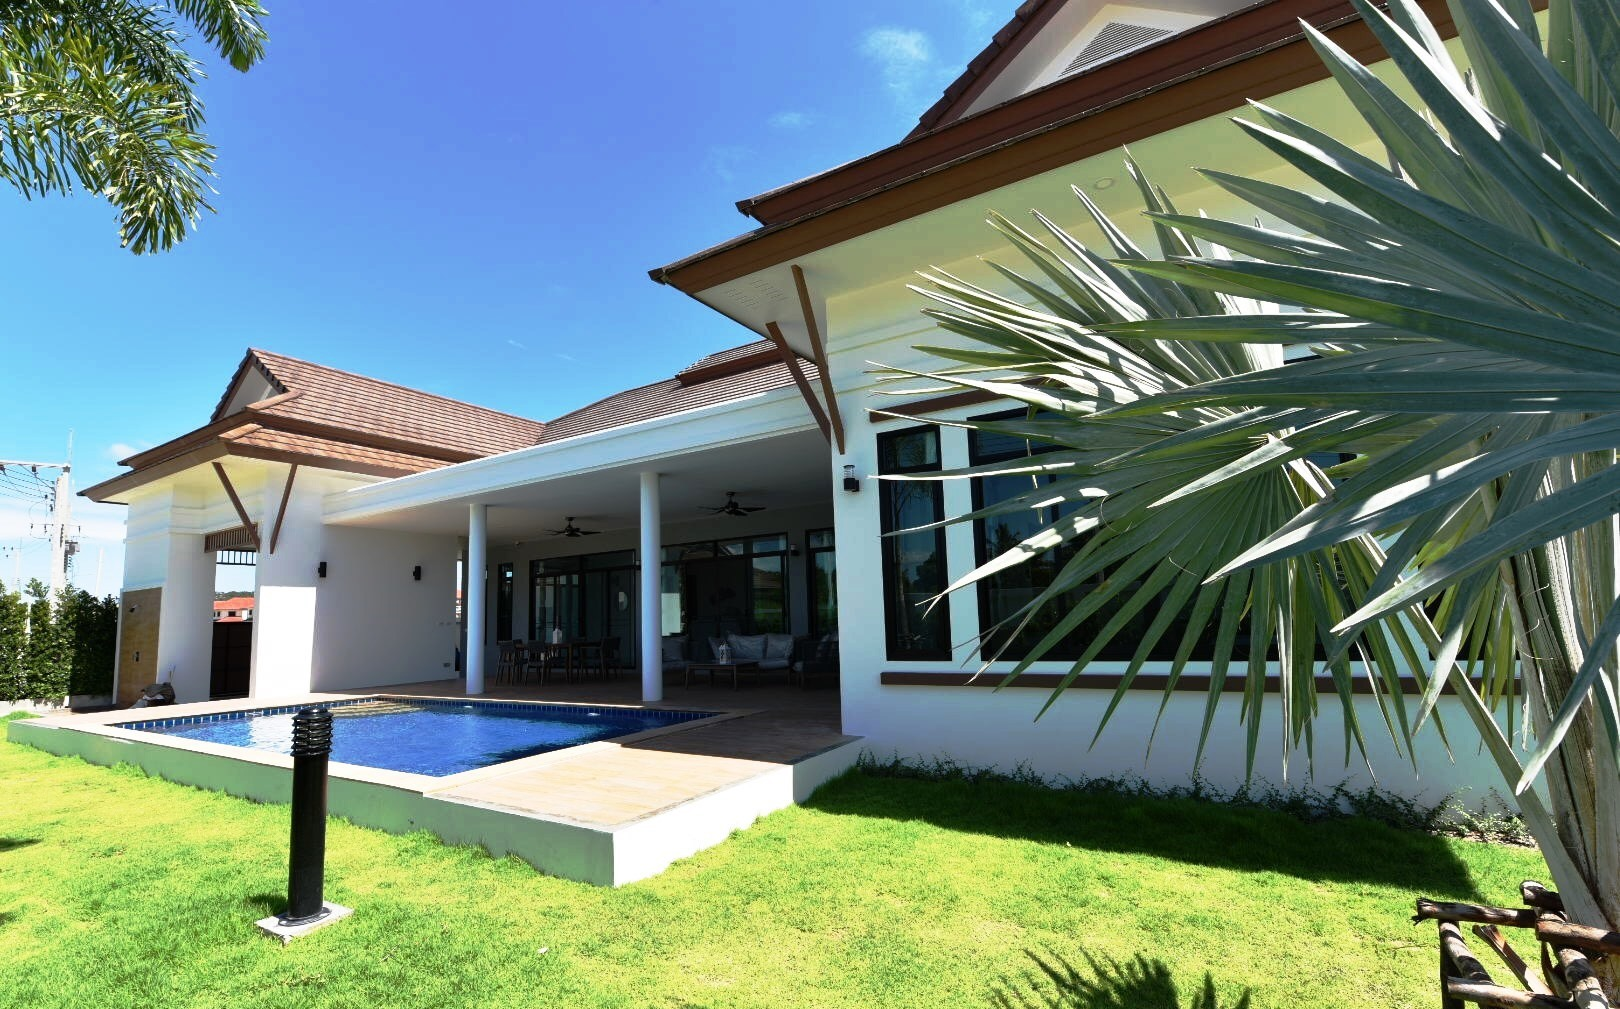 Brand new Pool Villas in Hua Hin next to Palm Hills Golf Resort